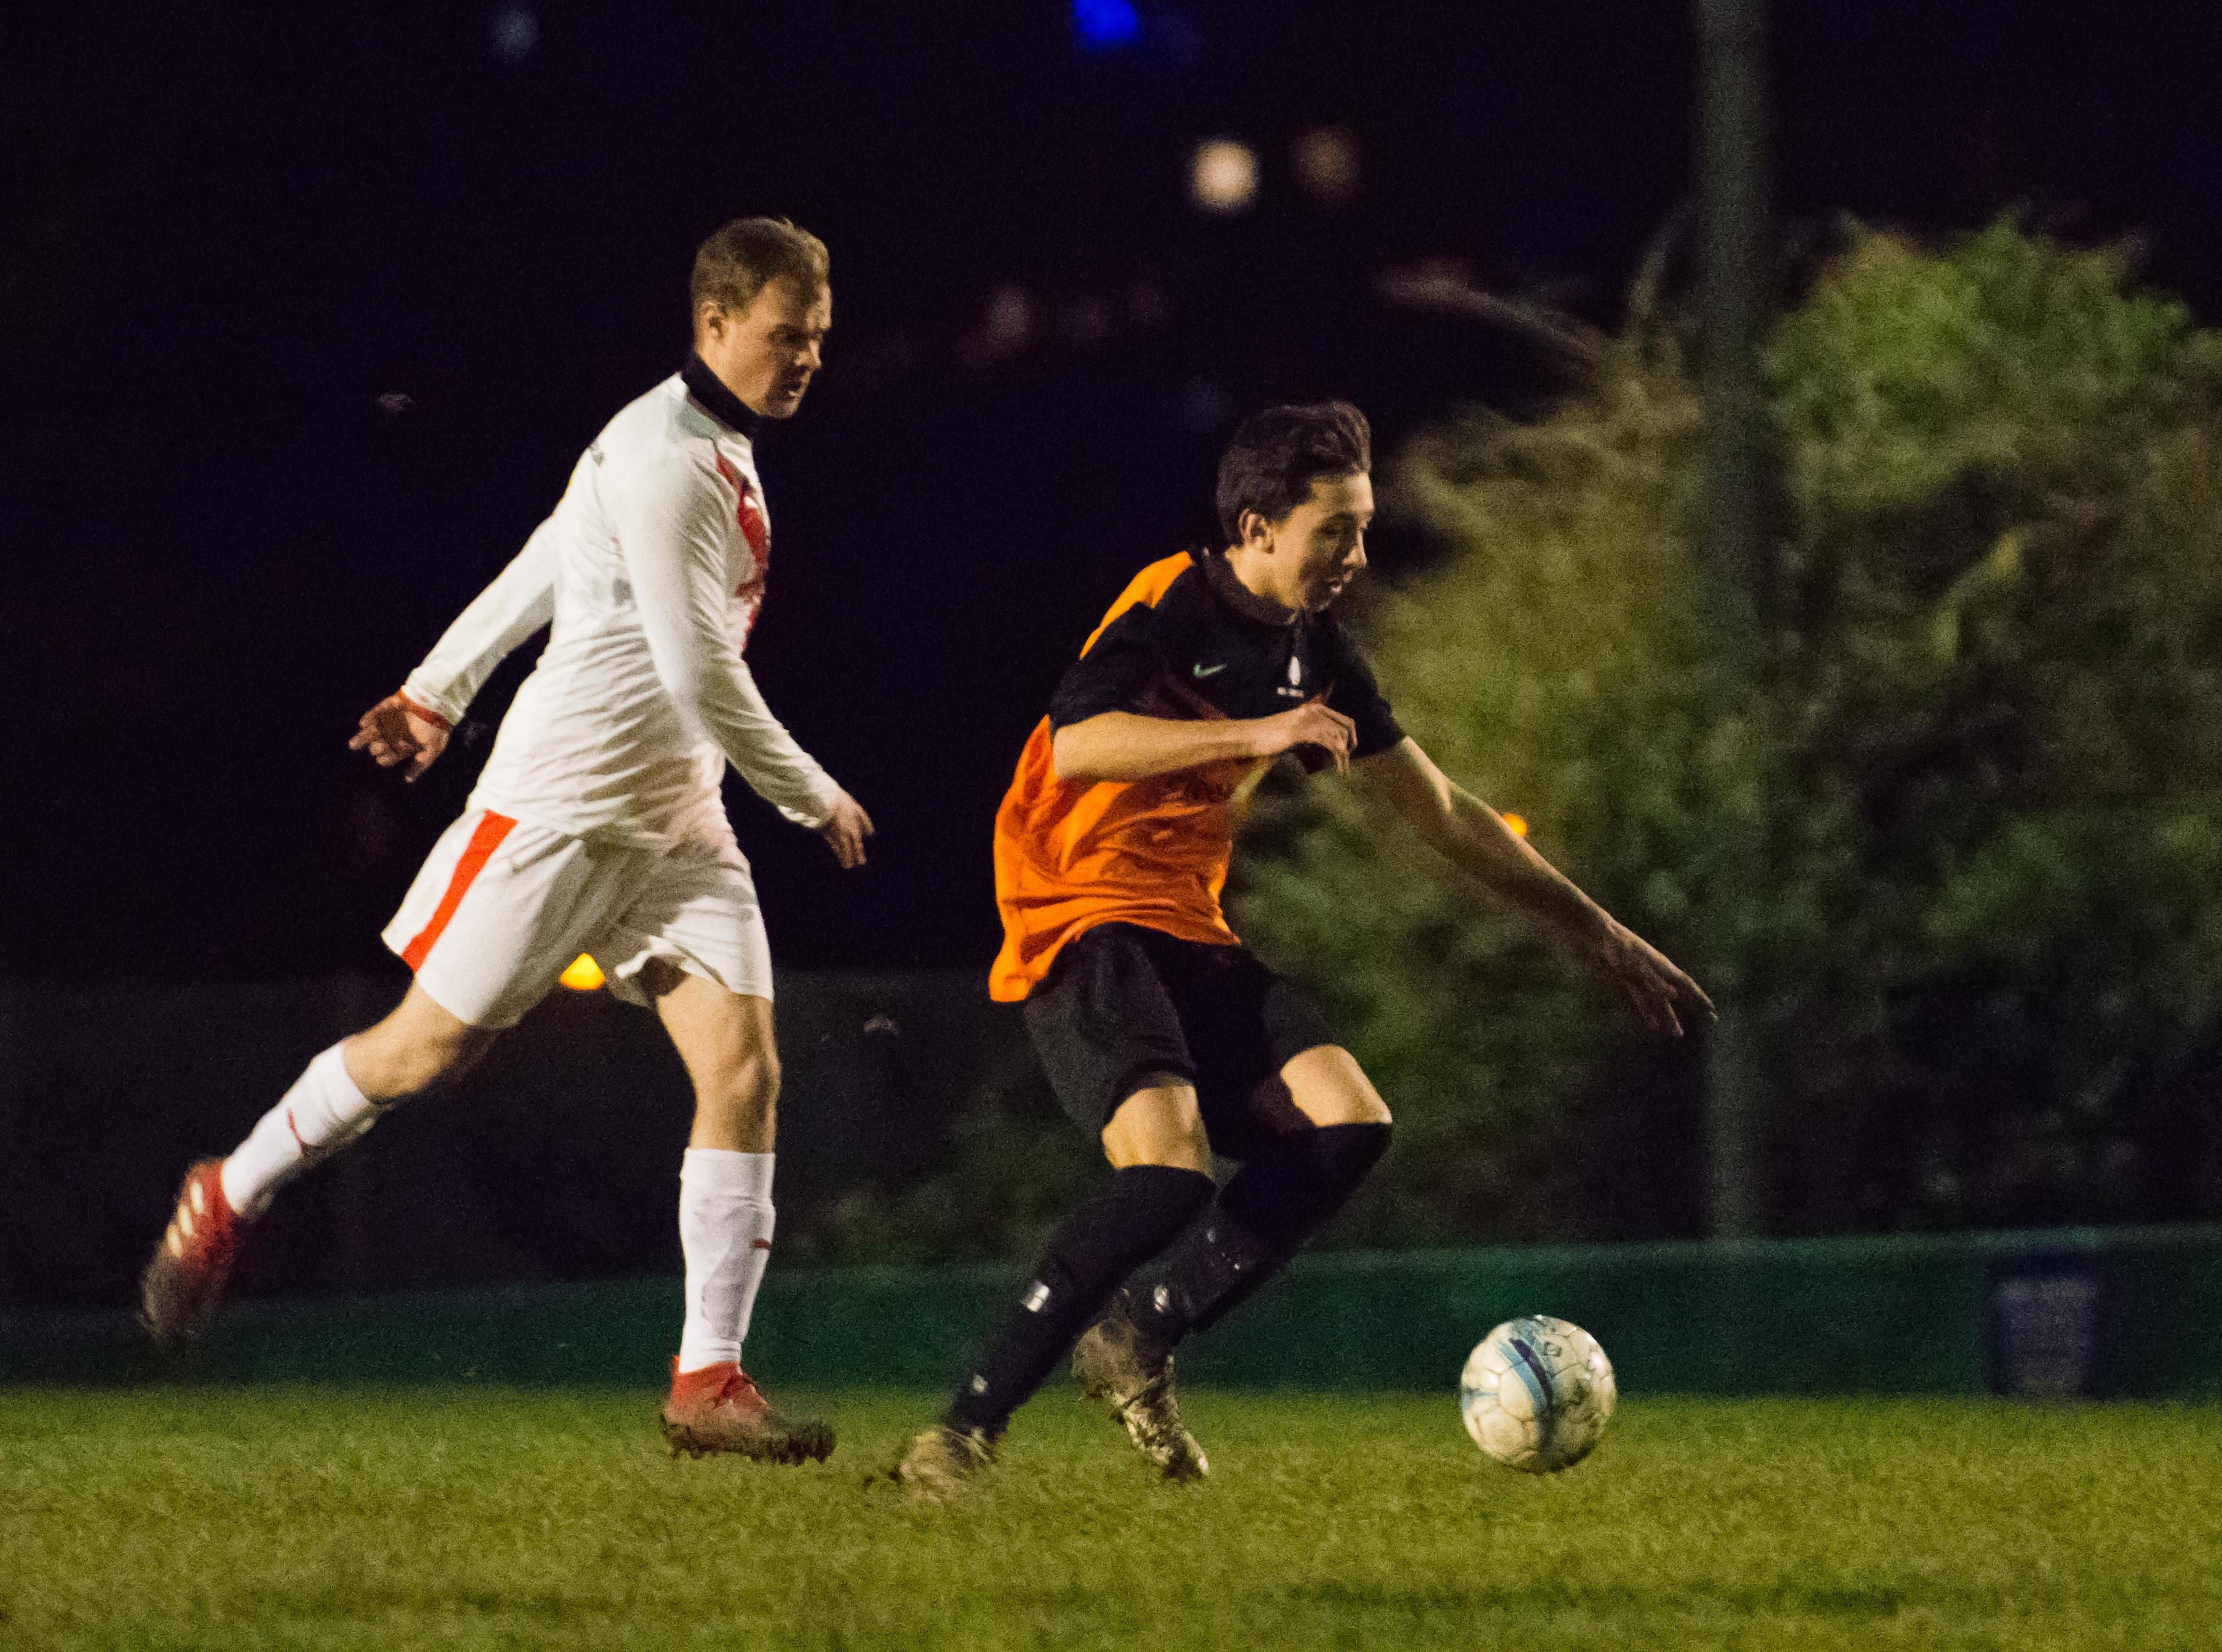 Mile Oak U21s vs Southwick FC U21s 14.12.17 04